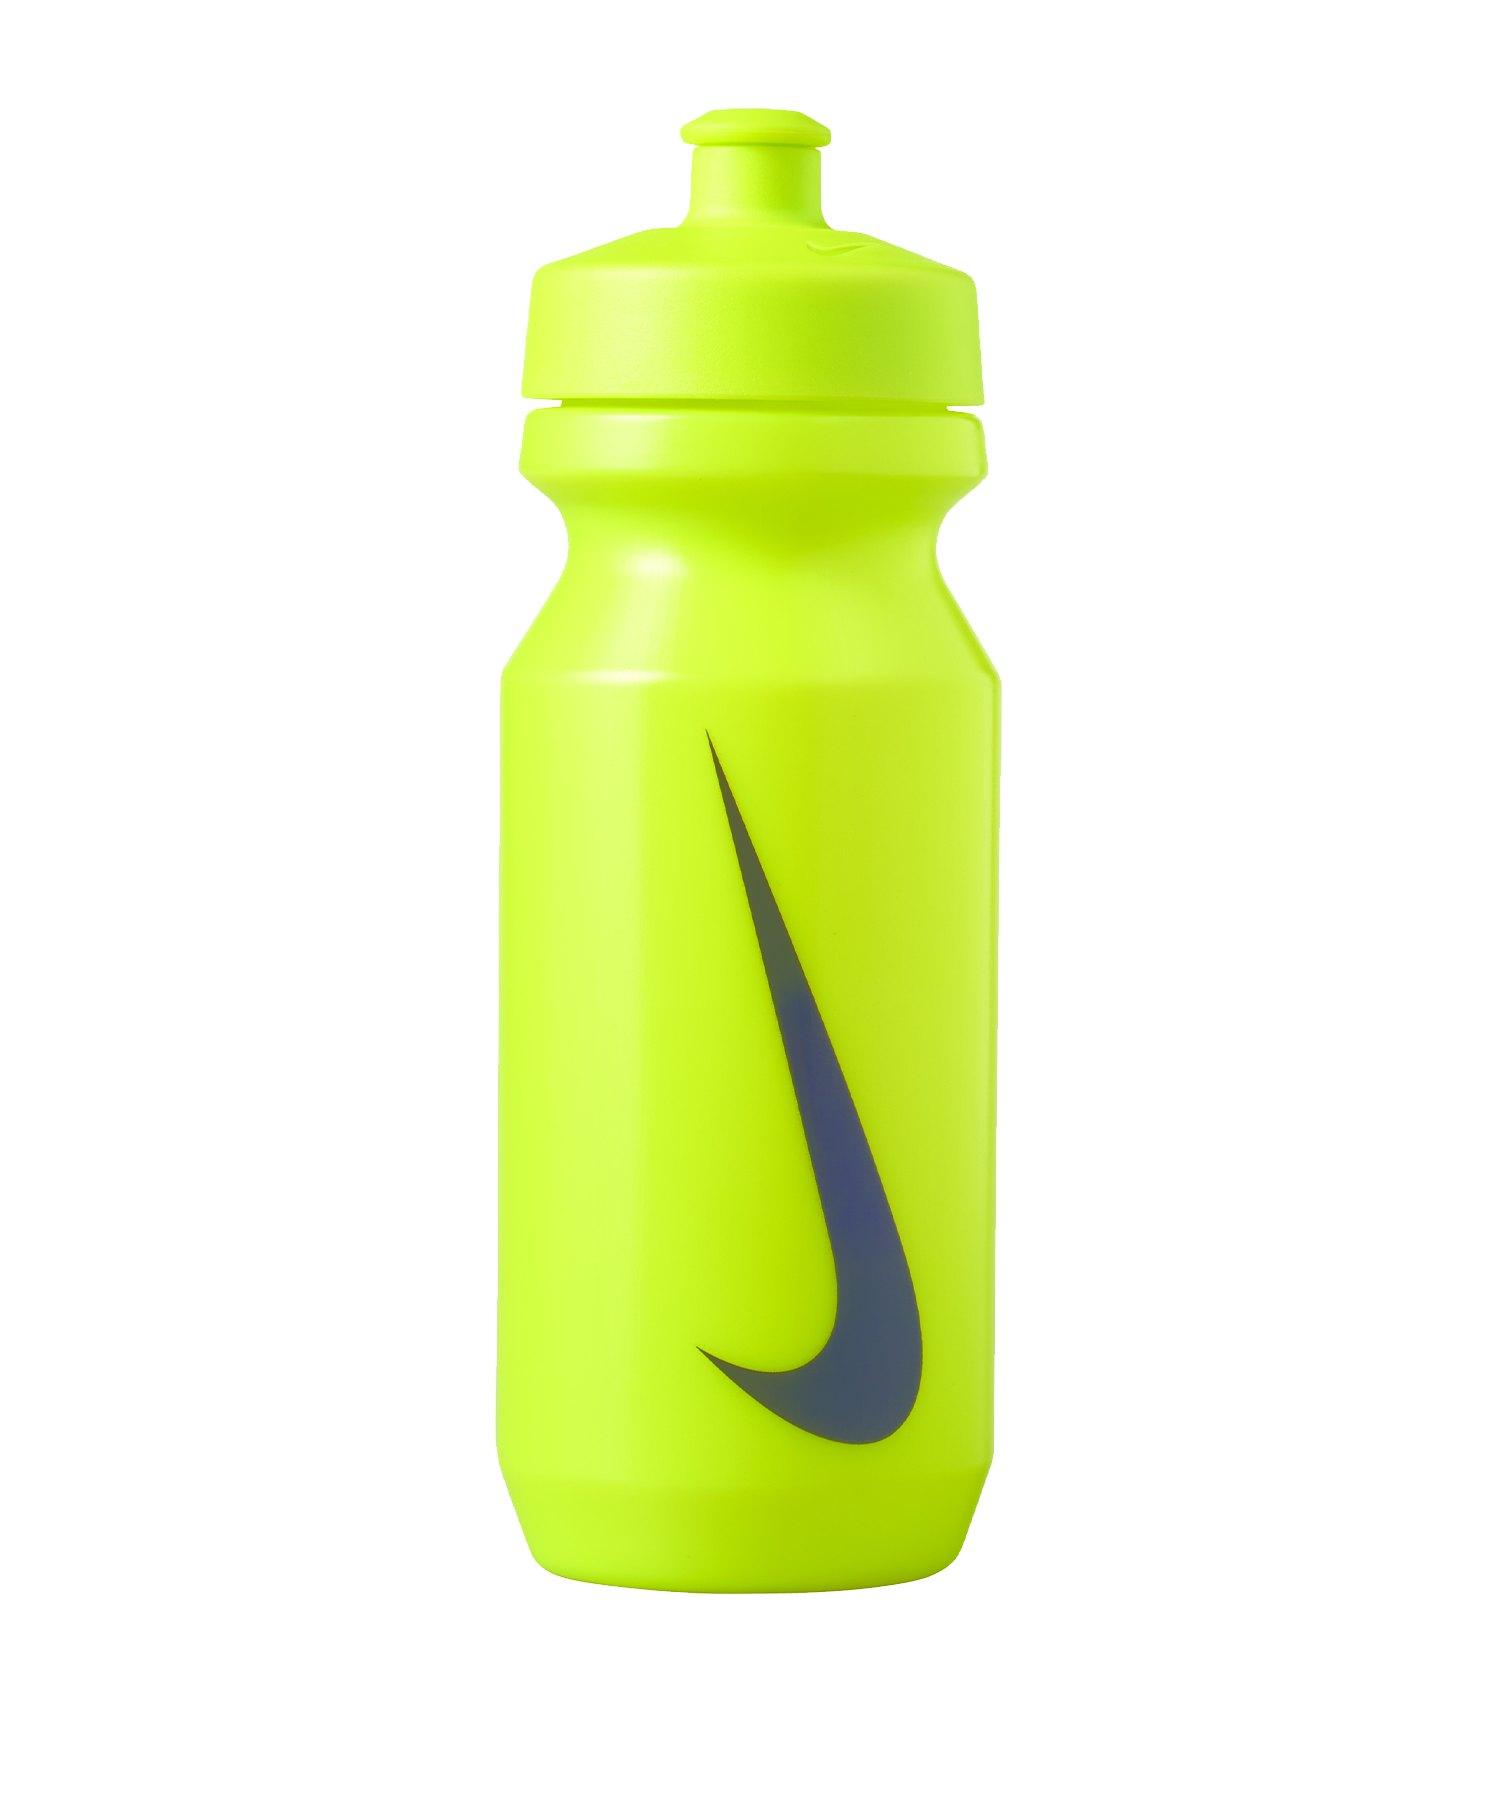 Nike Big Mouth Trinkflasche 650 ml F306 - gruen